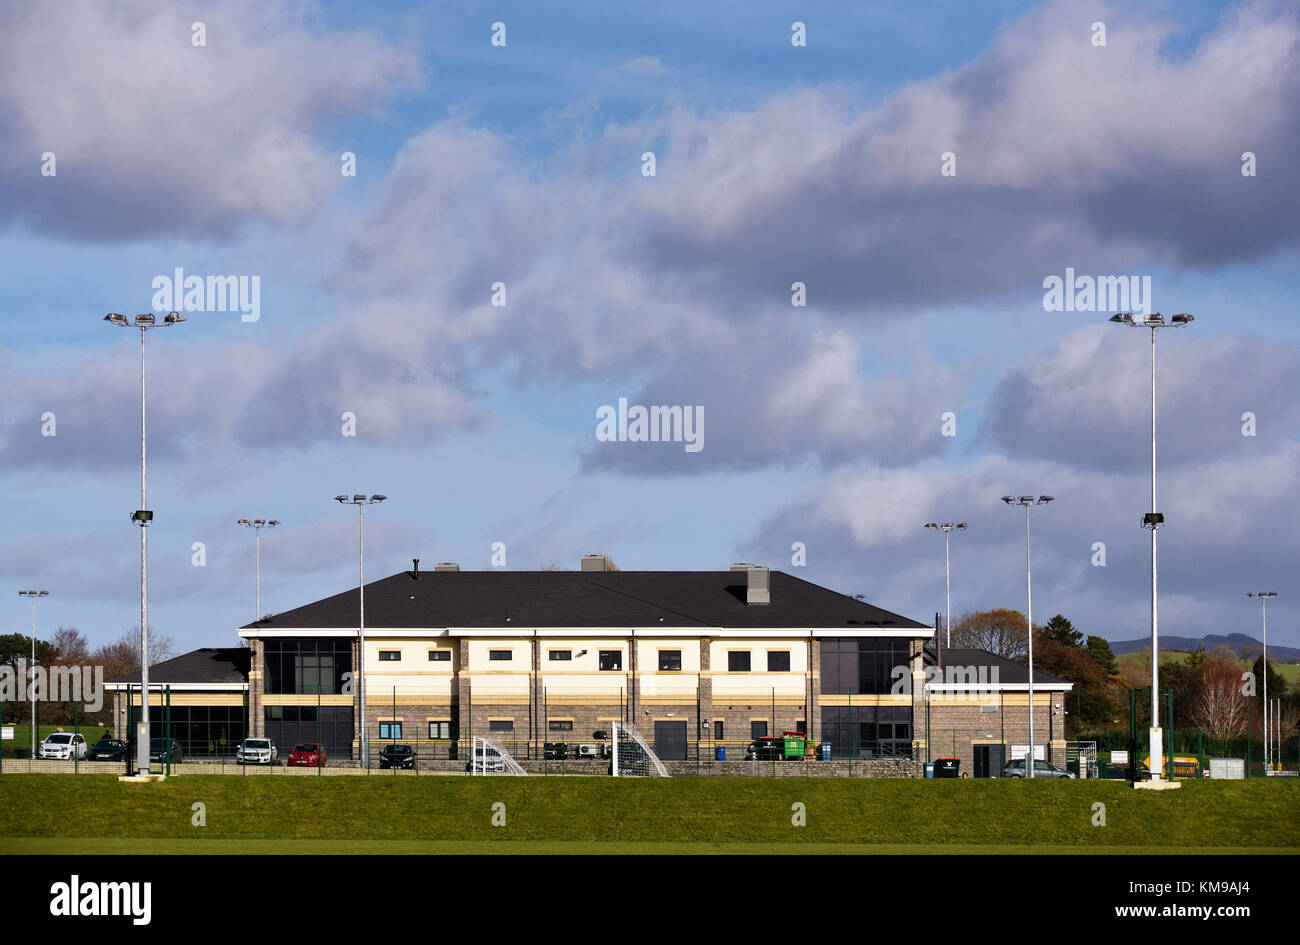 Kendal Rugby Union Football Club Clubhouse. Mint Bridge, Kendal, Cumbria, England, United Kingdom, Europe. - Stock Image